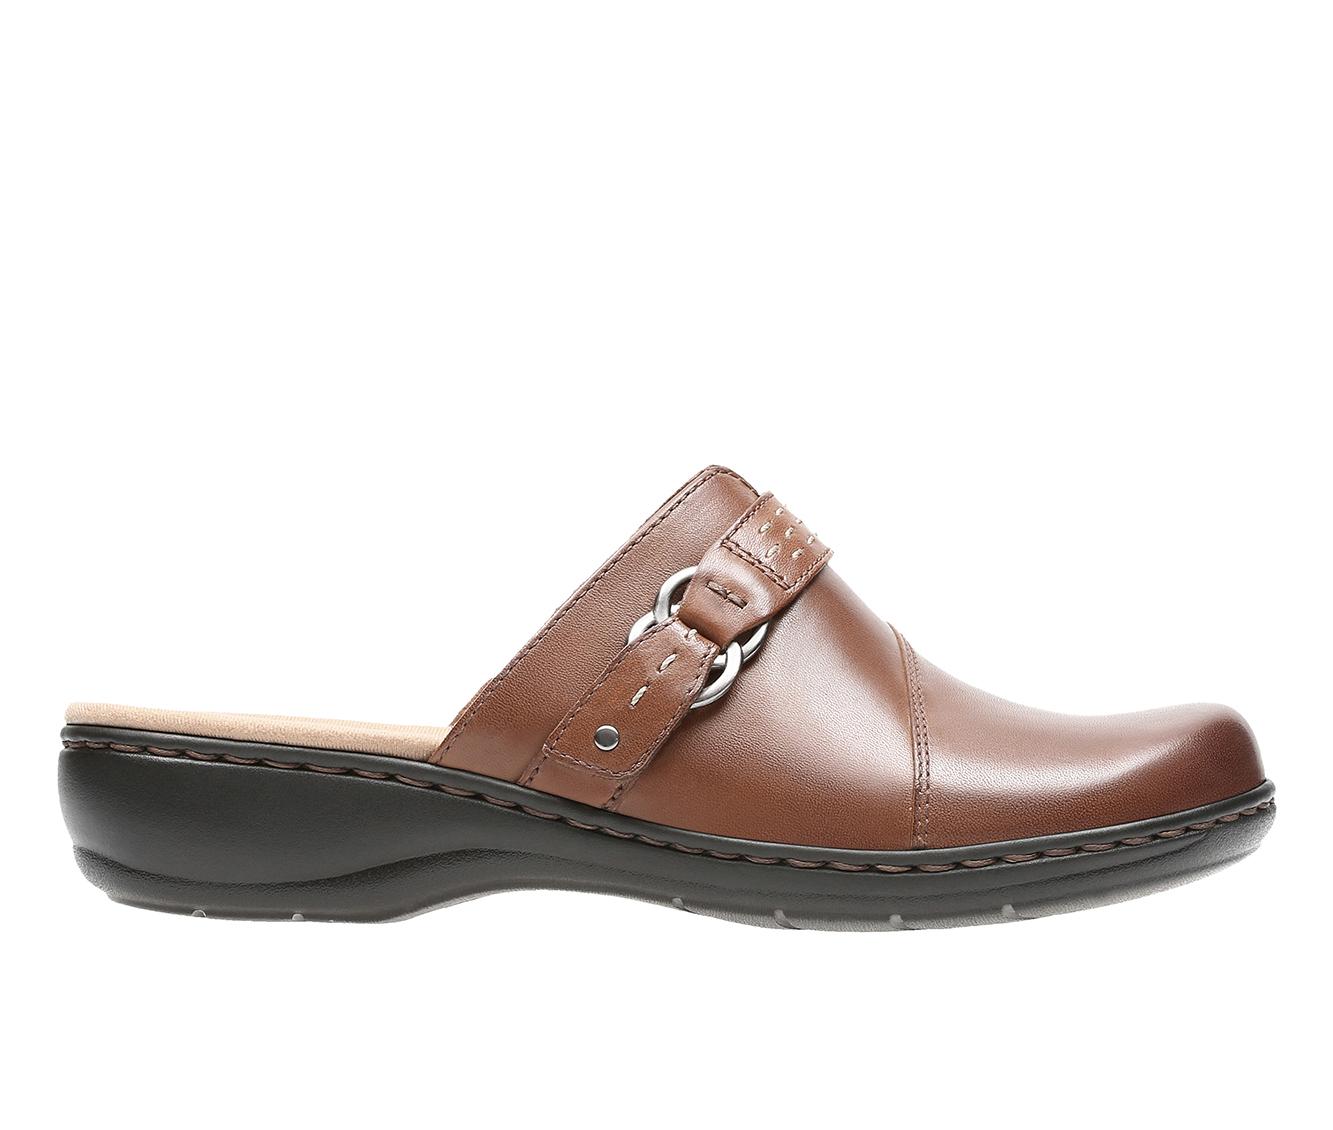 Clarks Leisa Sadie Women's Shoe (Brown Leather)